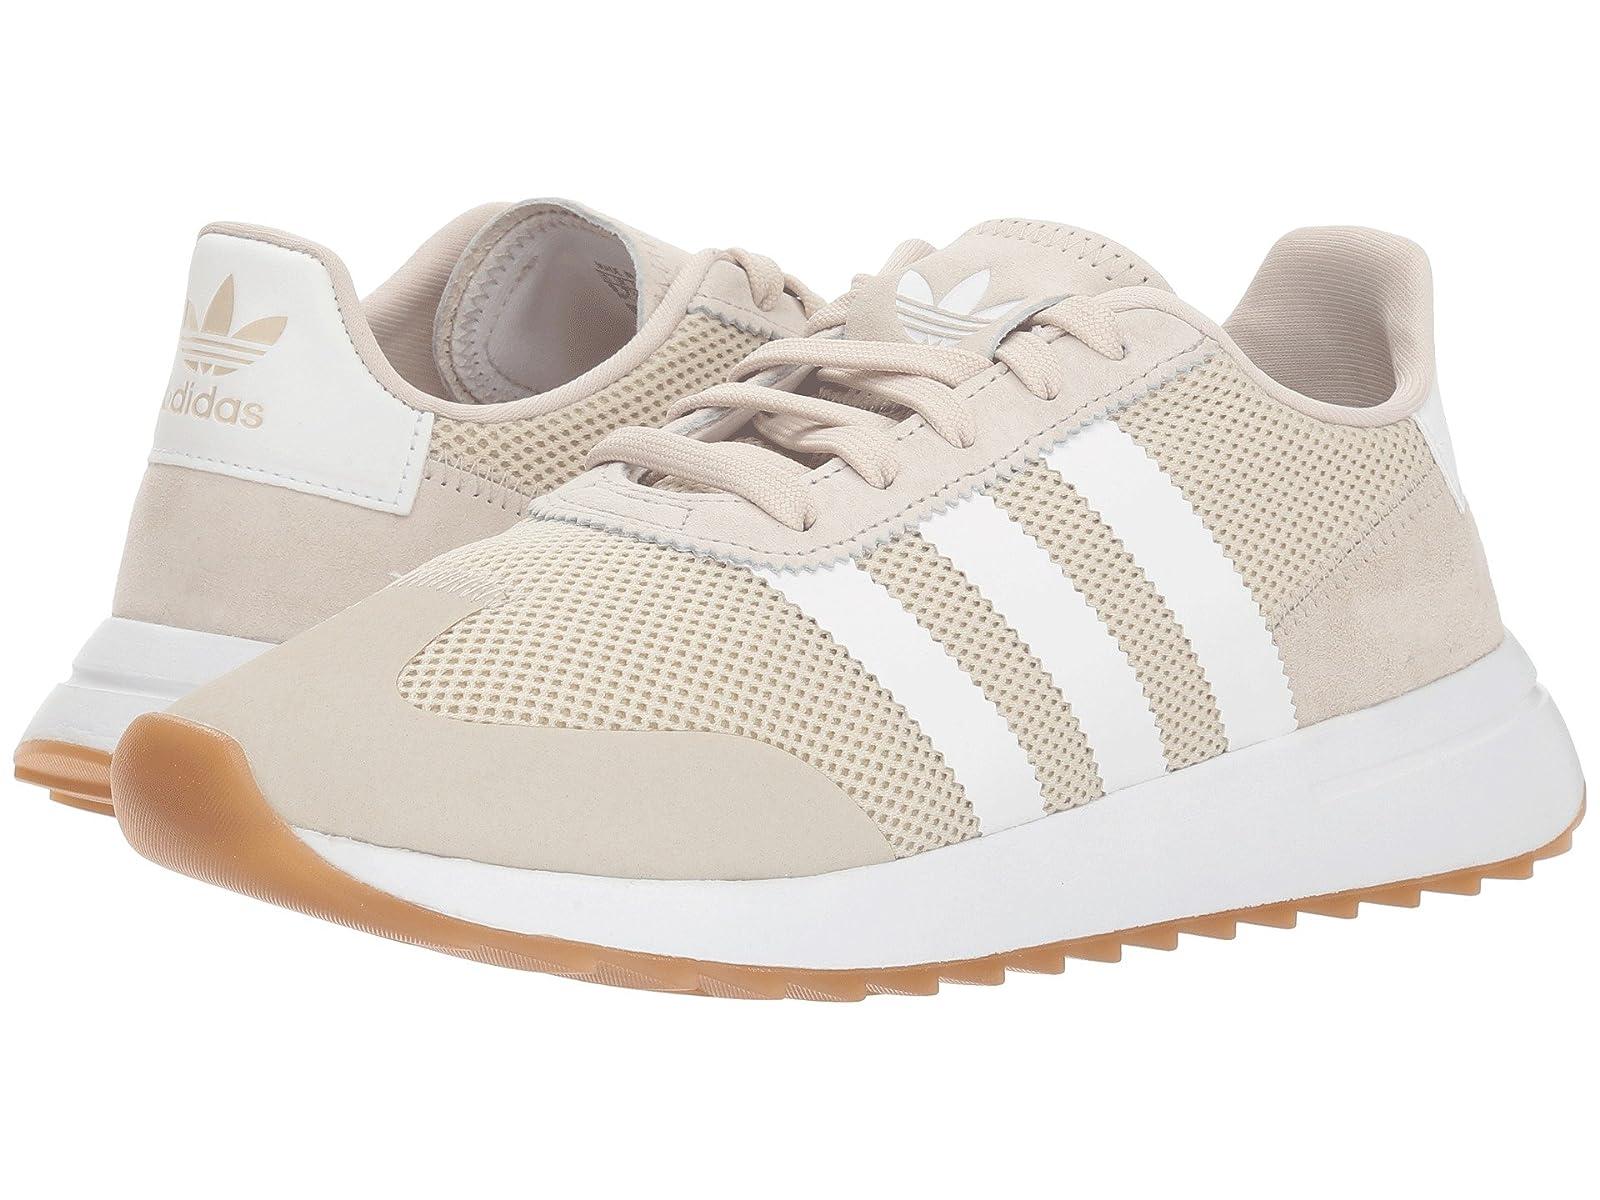 adidas Originals FLB_Runner WAtmospheric grades have affordable shoes